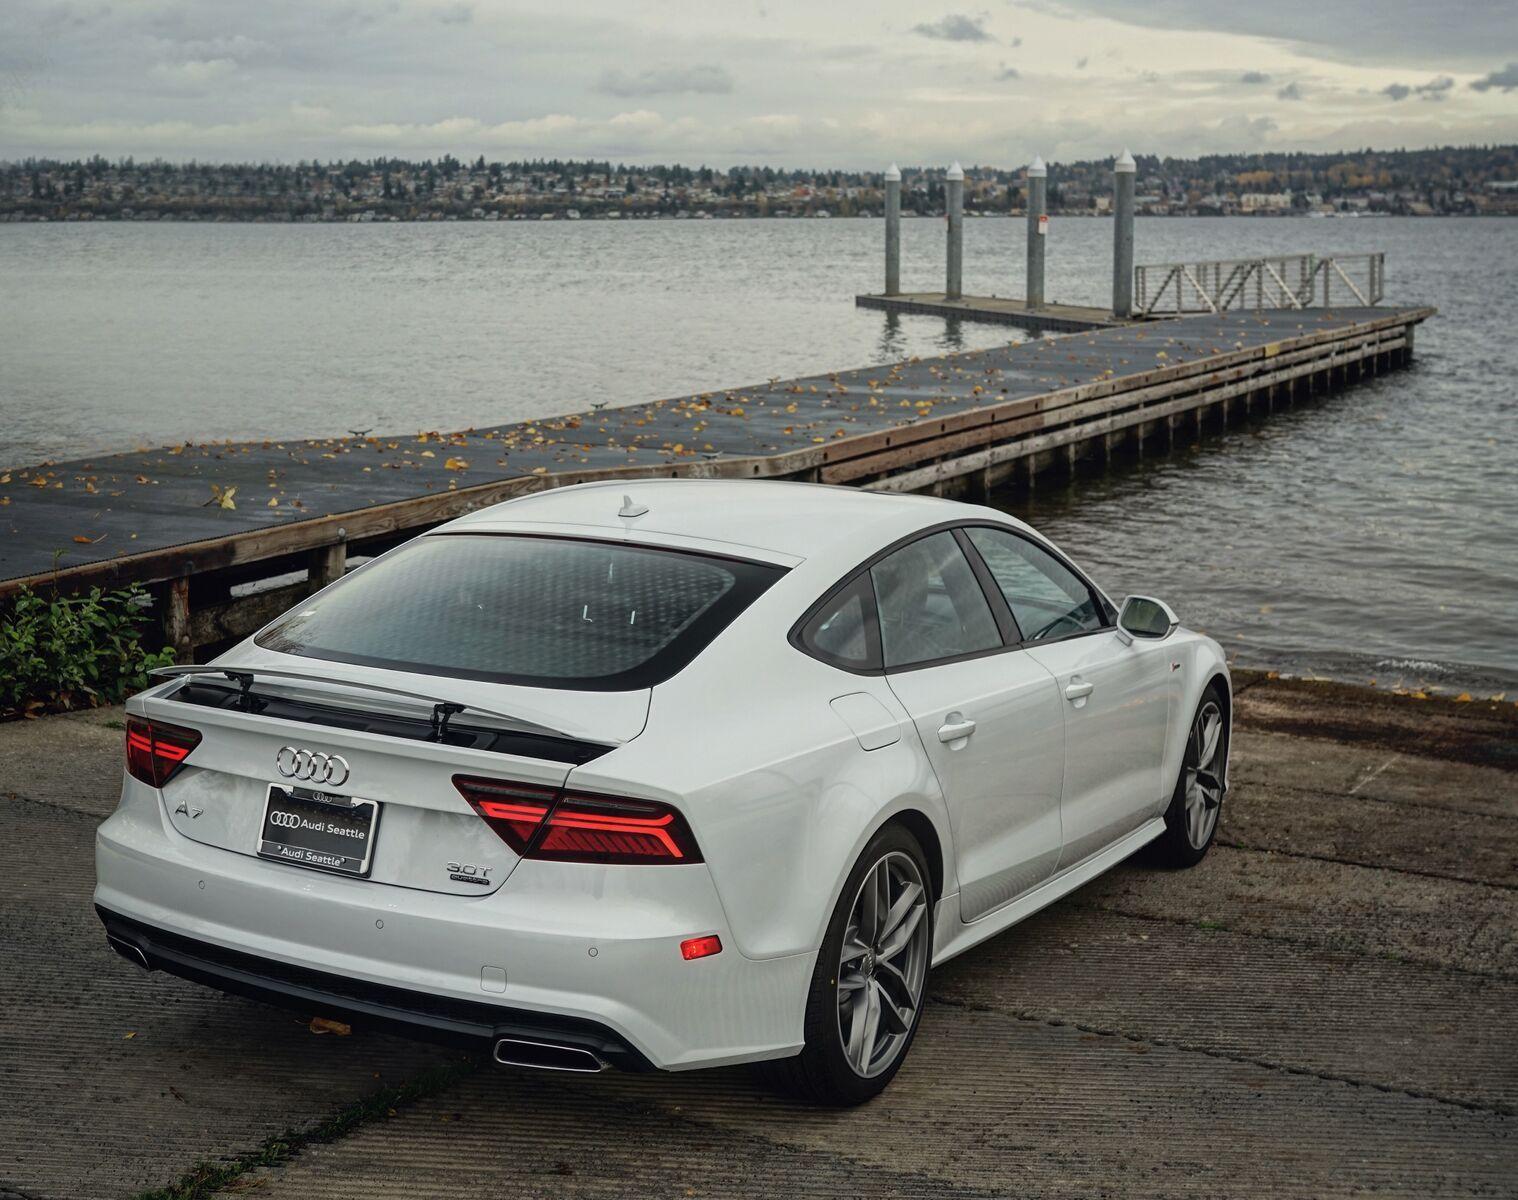 2016 Glacier White A7 Audi Seattle U District Seattle Wa Audiseattle Com Avtomobil